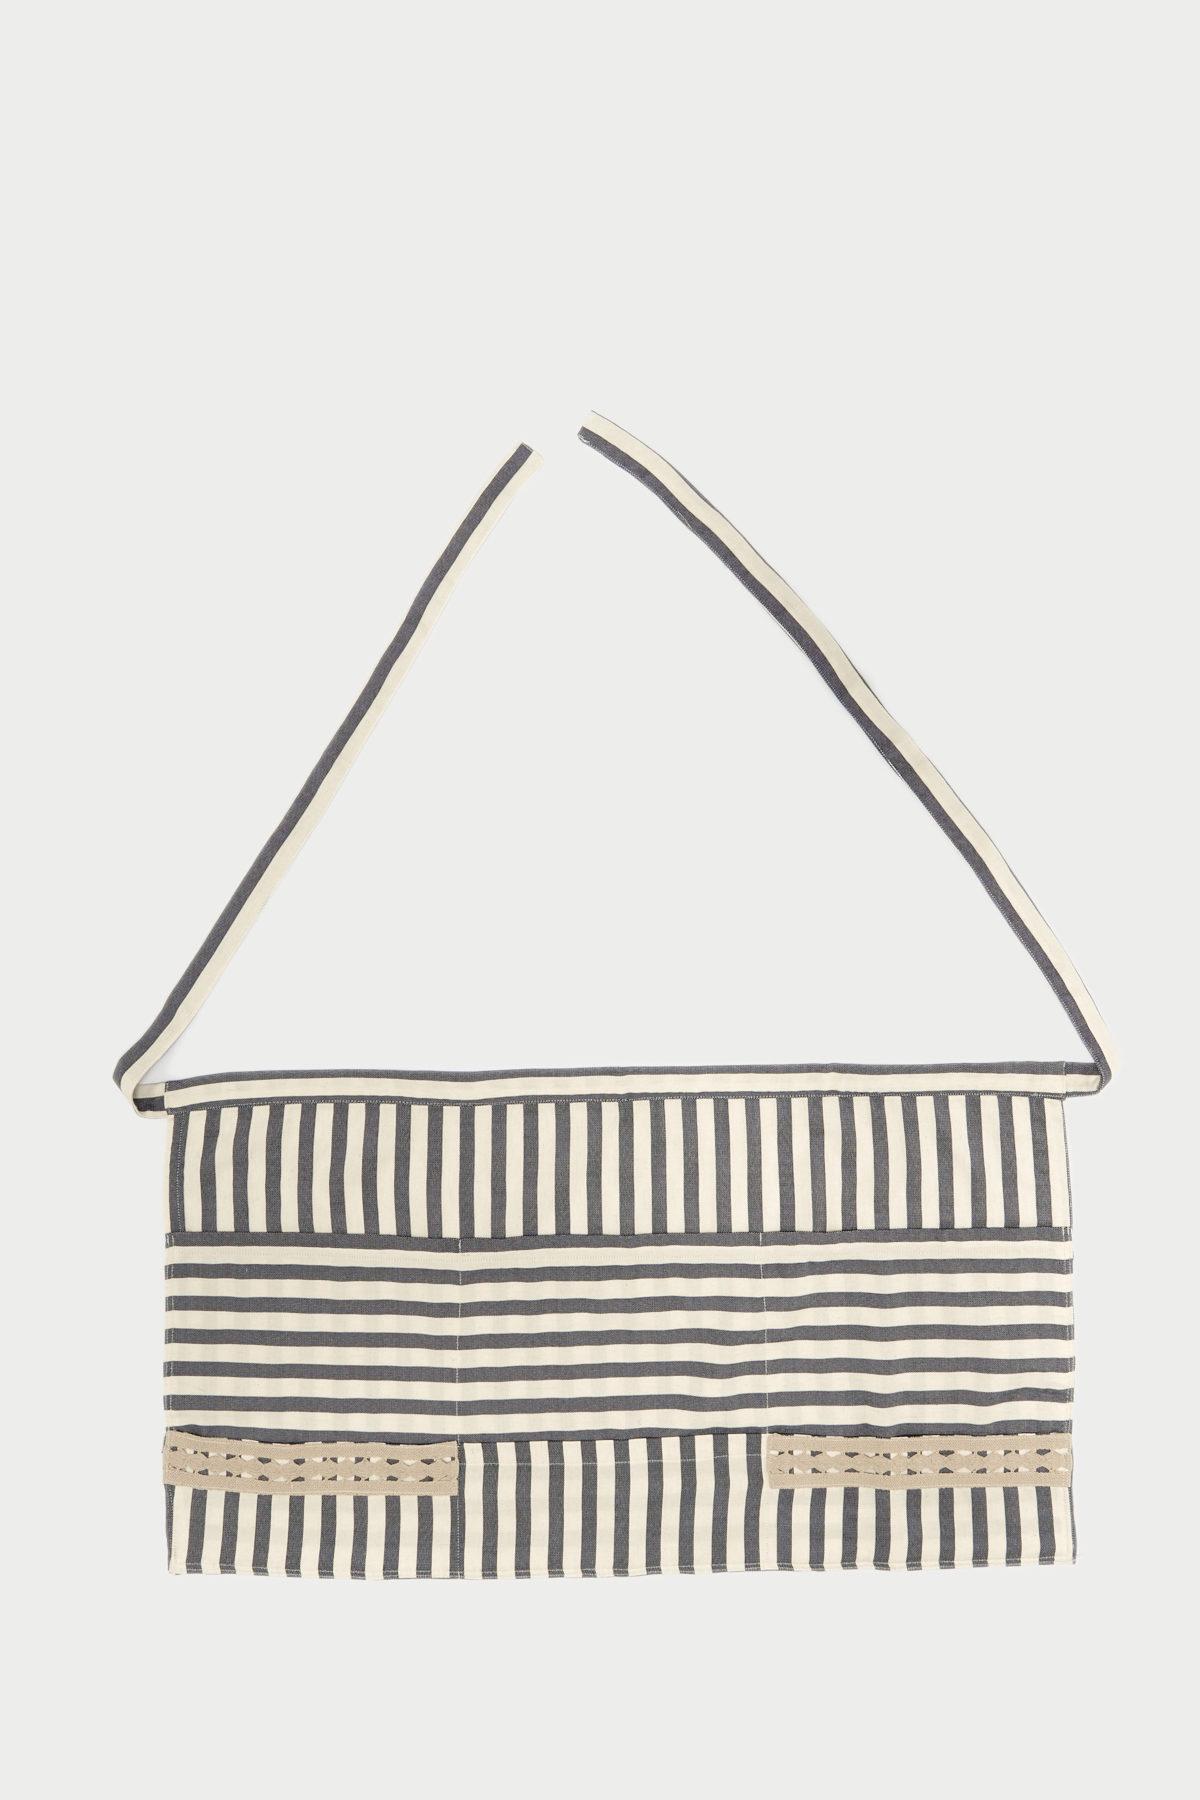 grembiule-apron-short-apron-textiles-kitchen-tessili-da-cucina-impertinente.shop